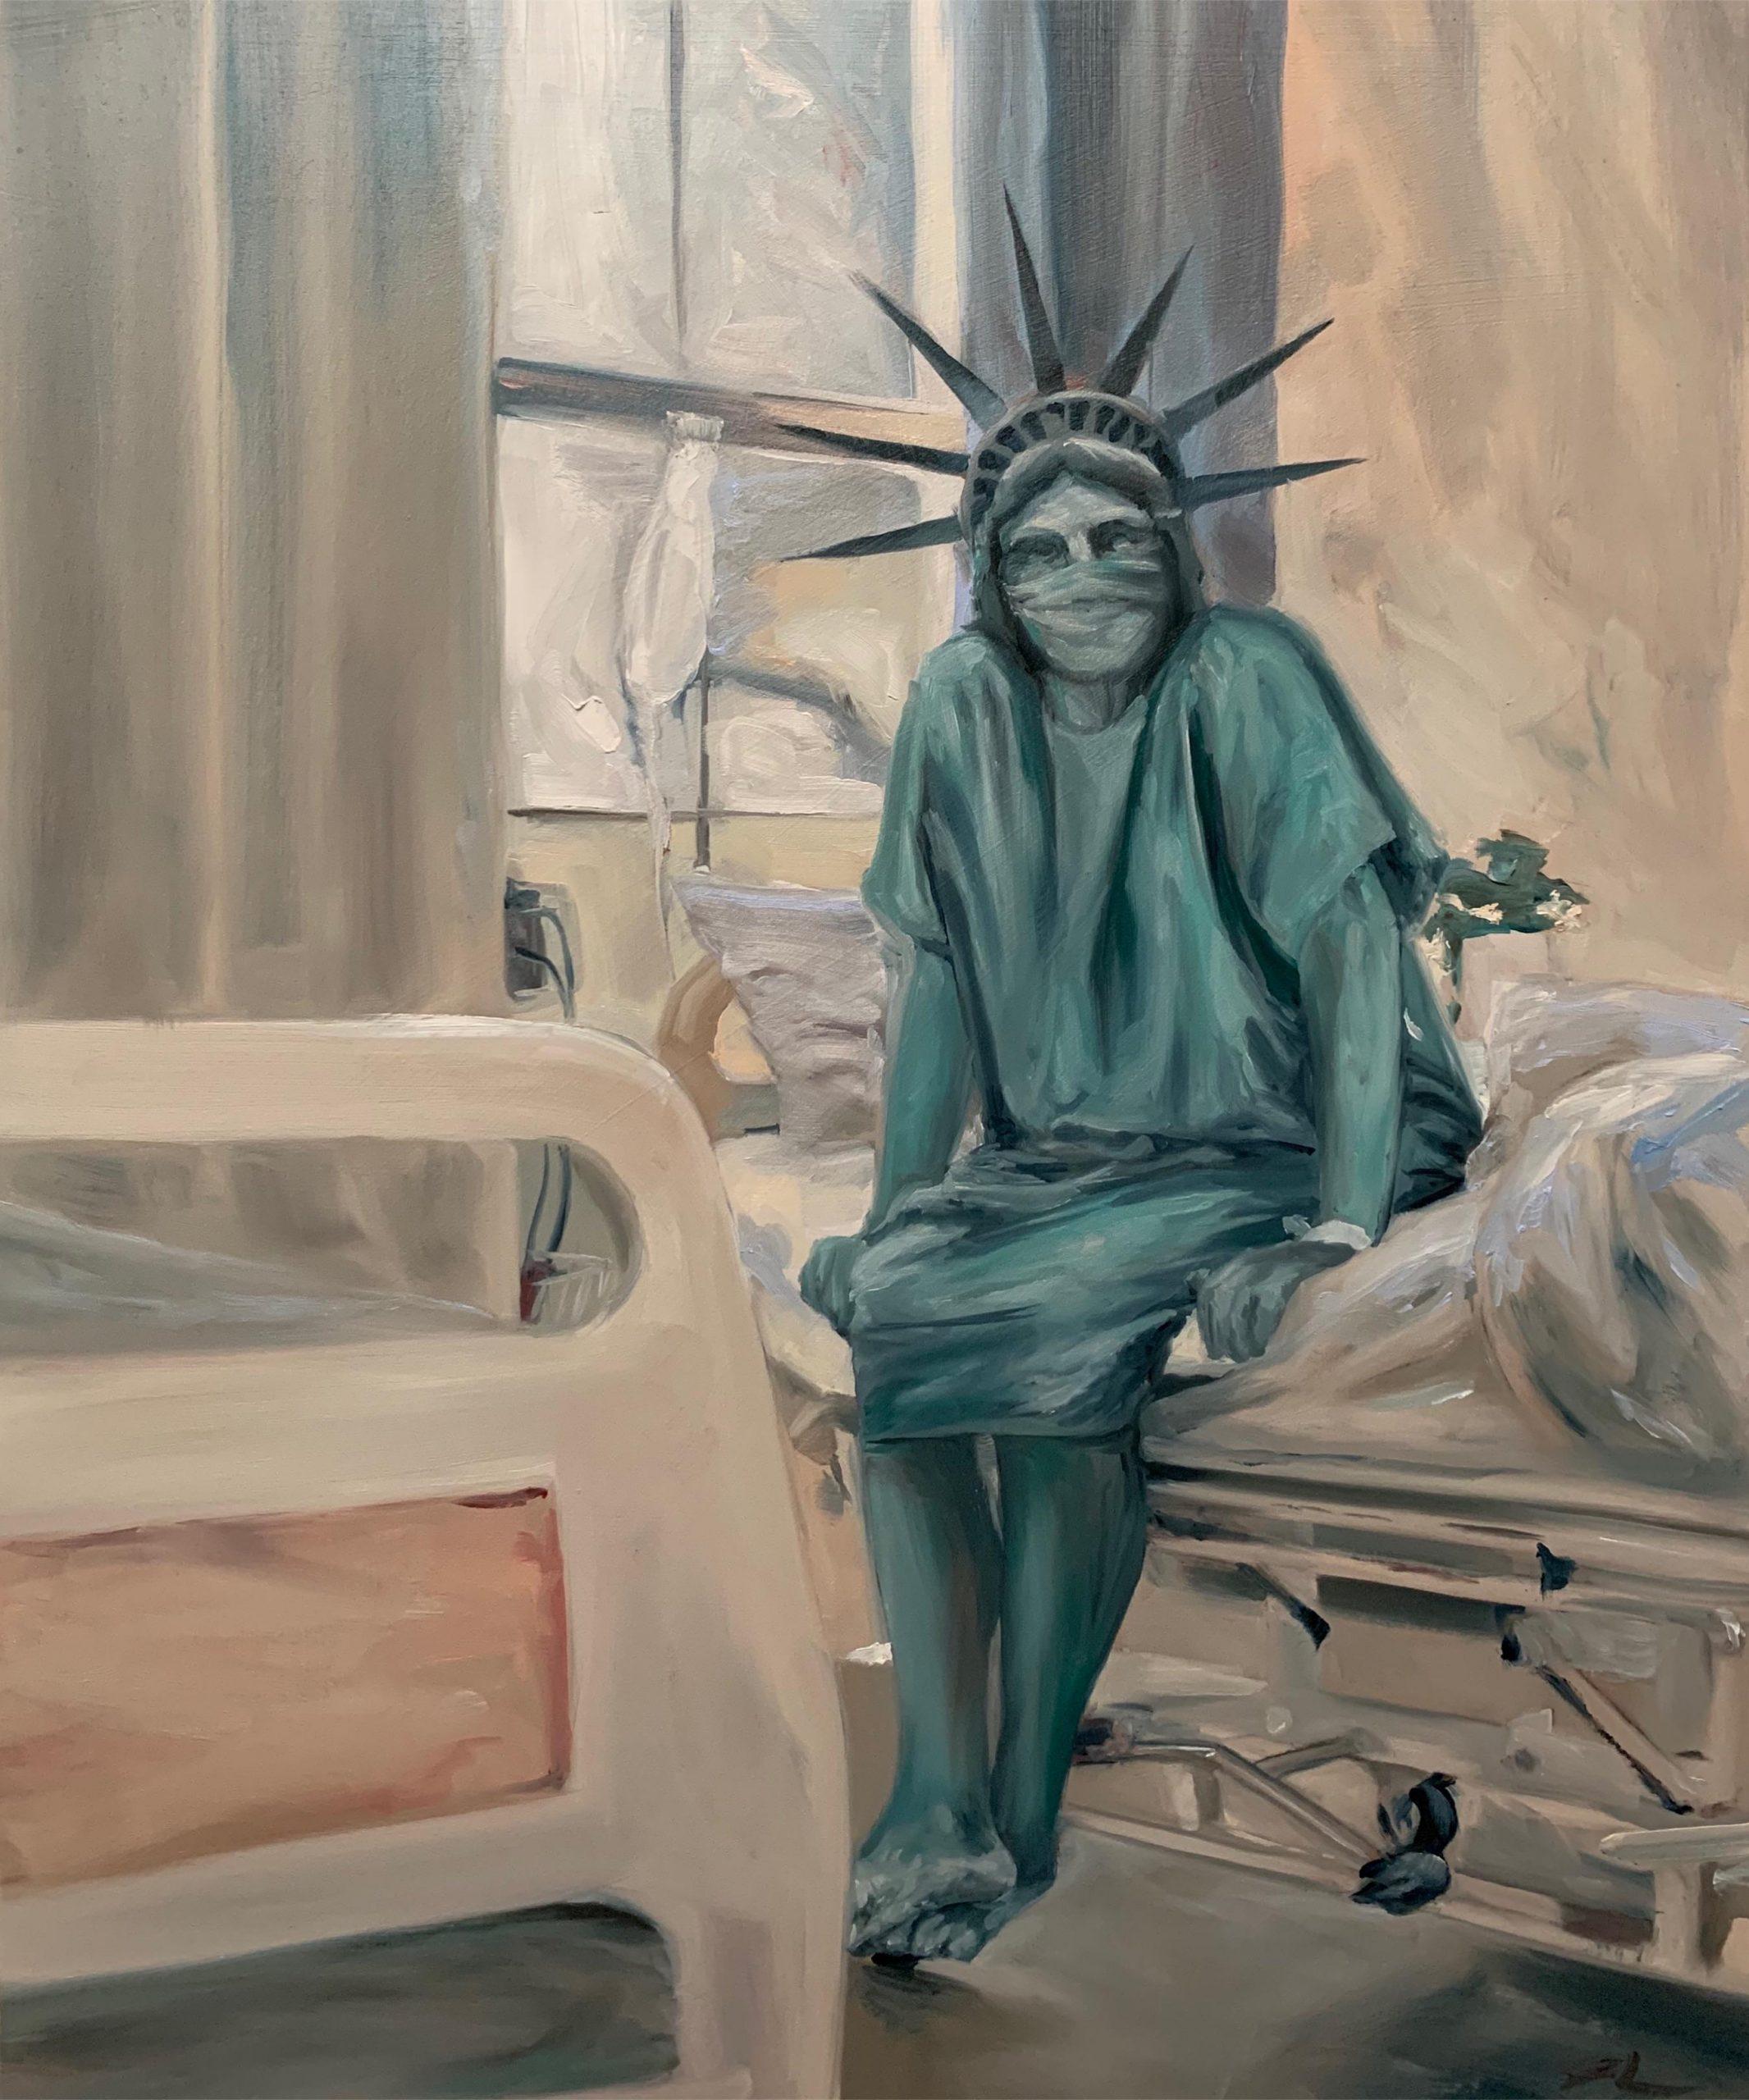 Liberty is sick